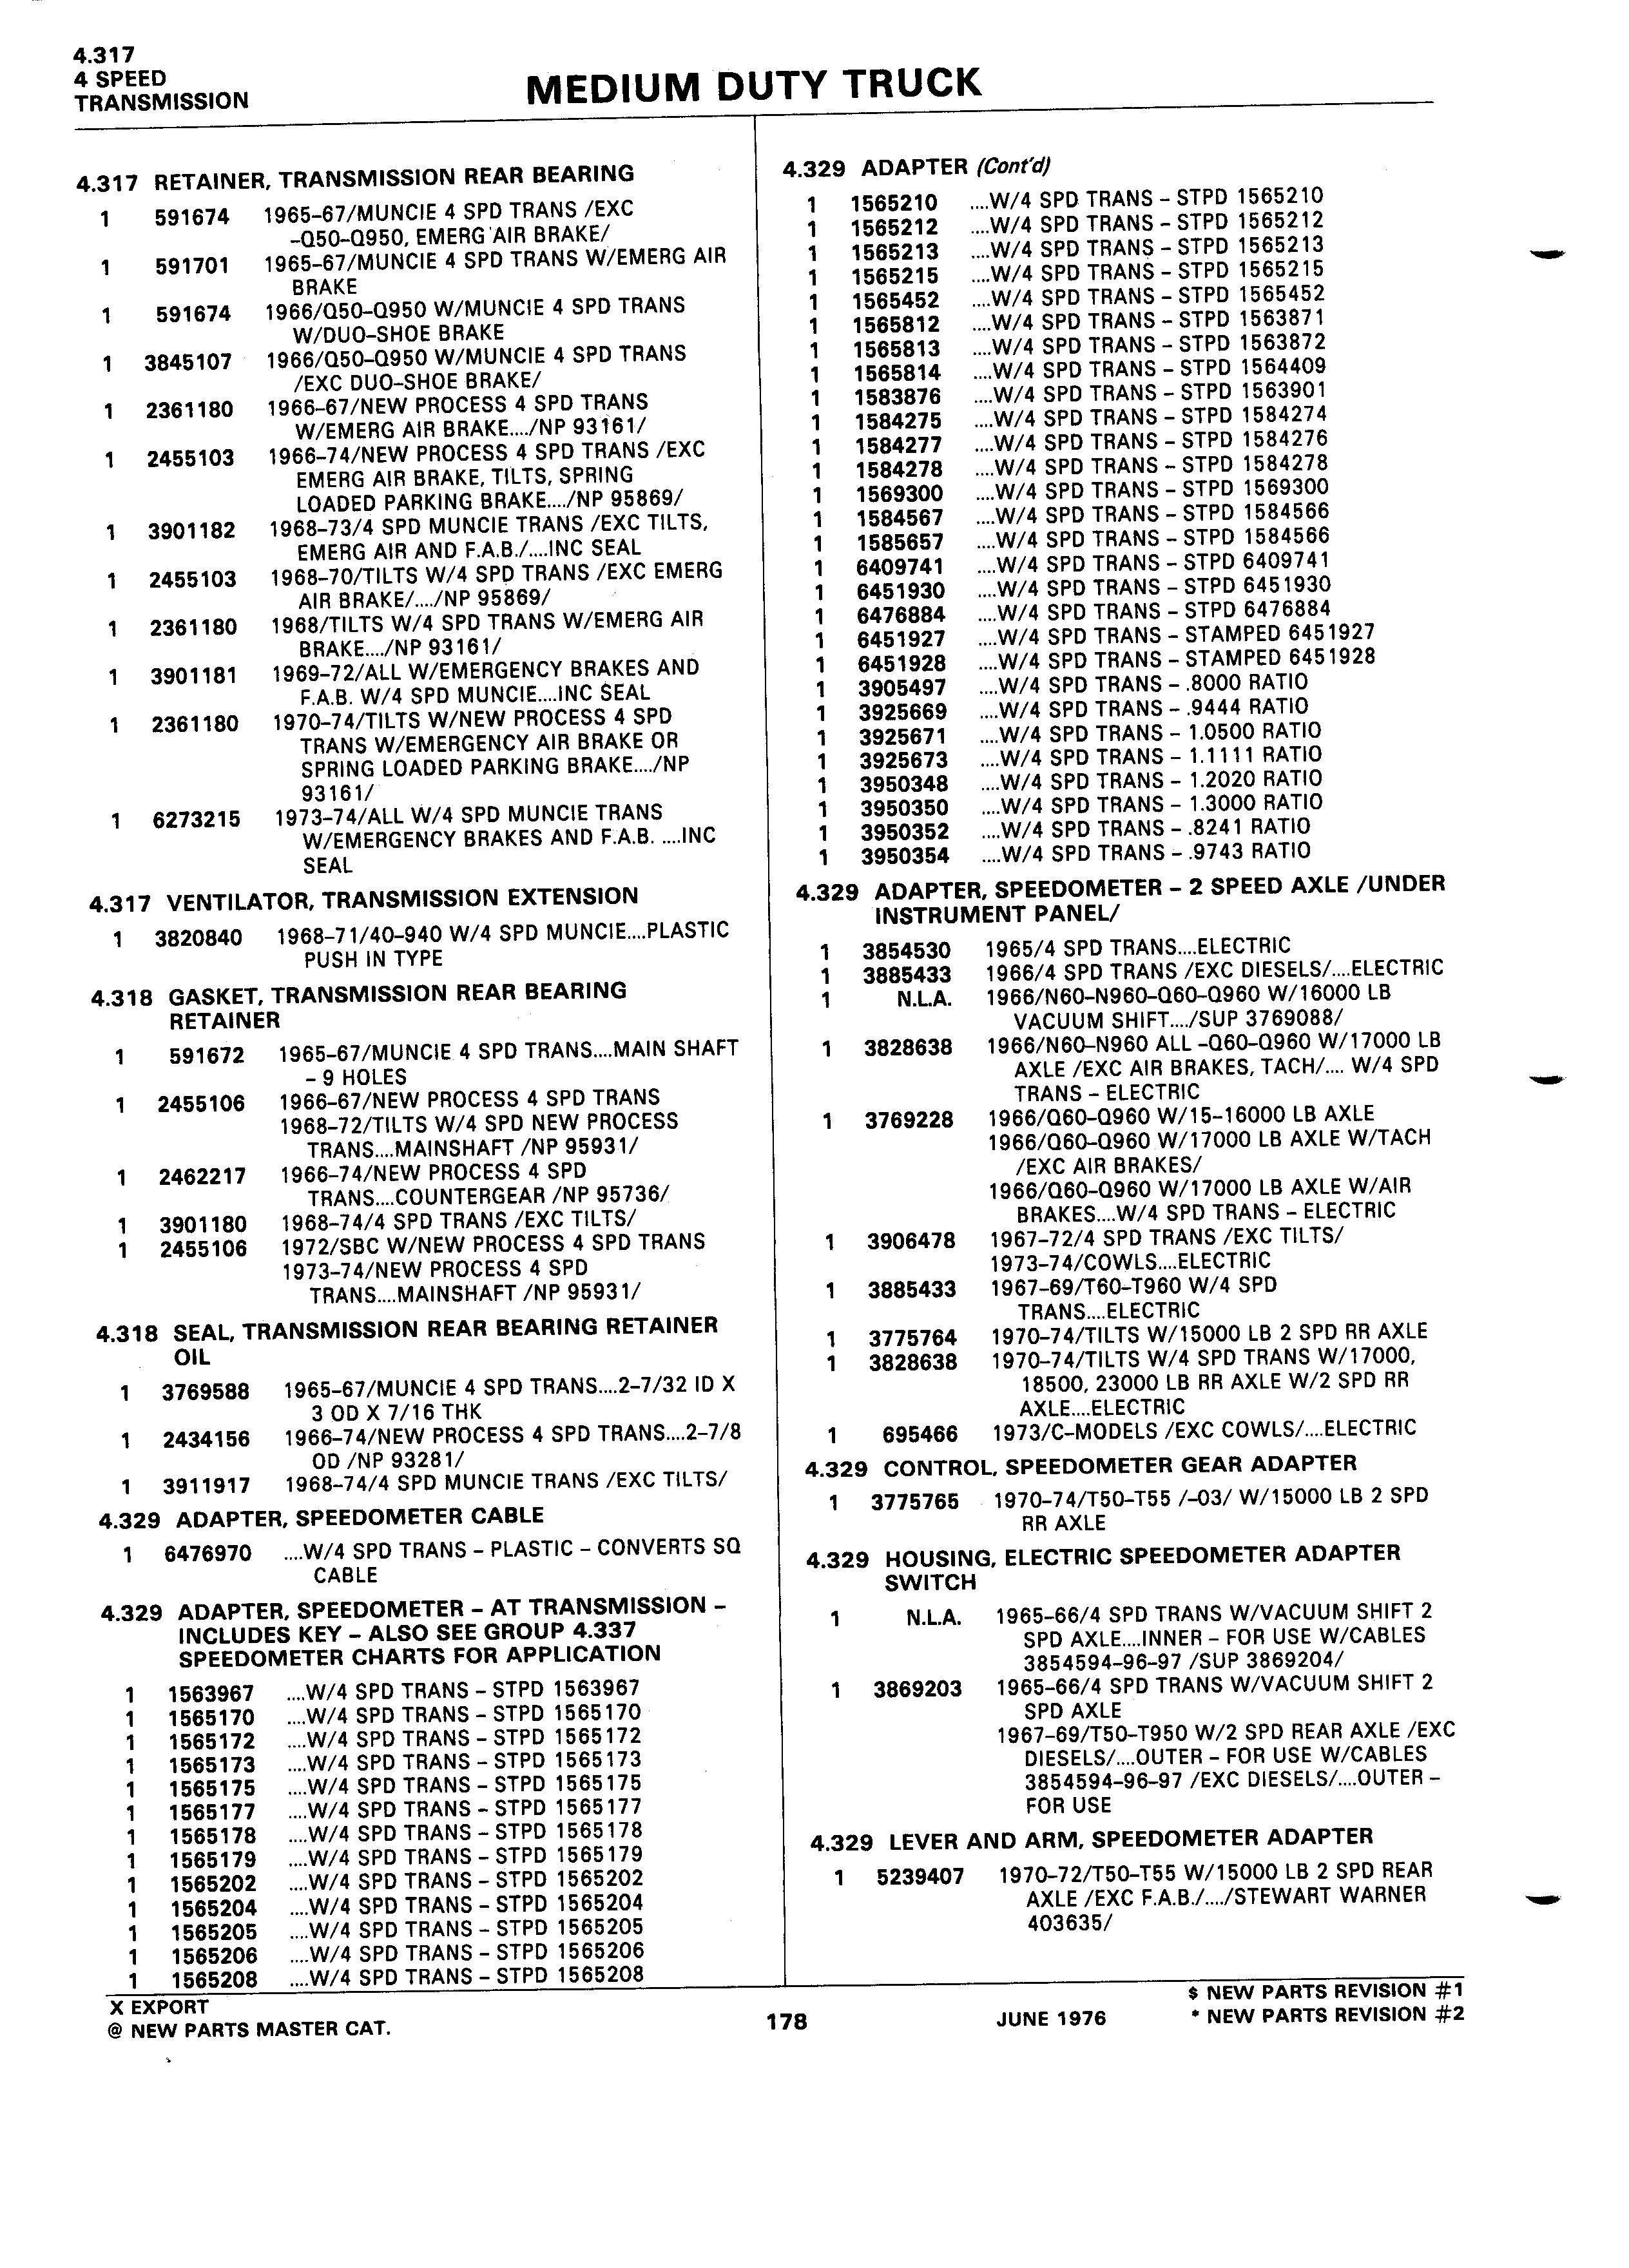 trans am restoration parts catalog